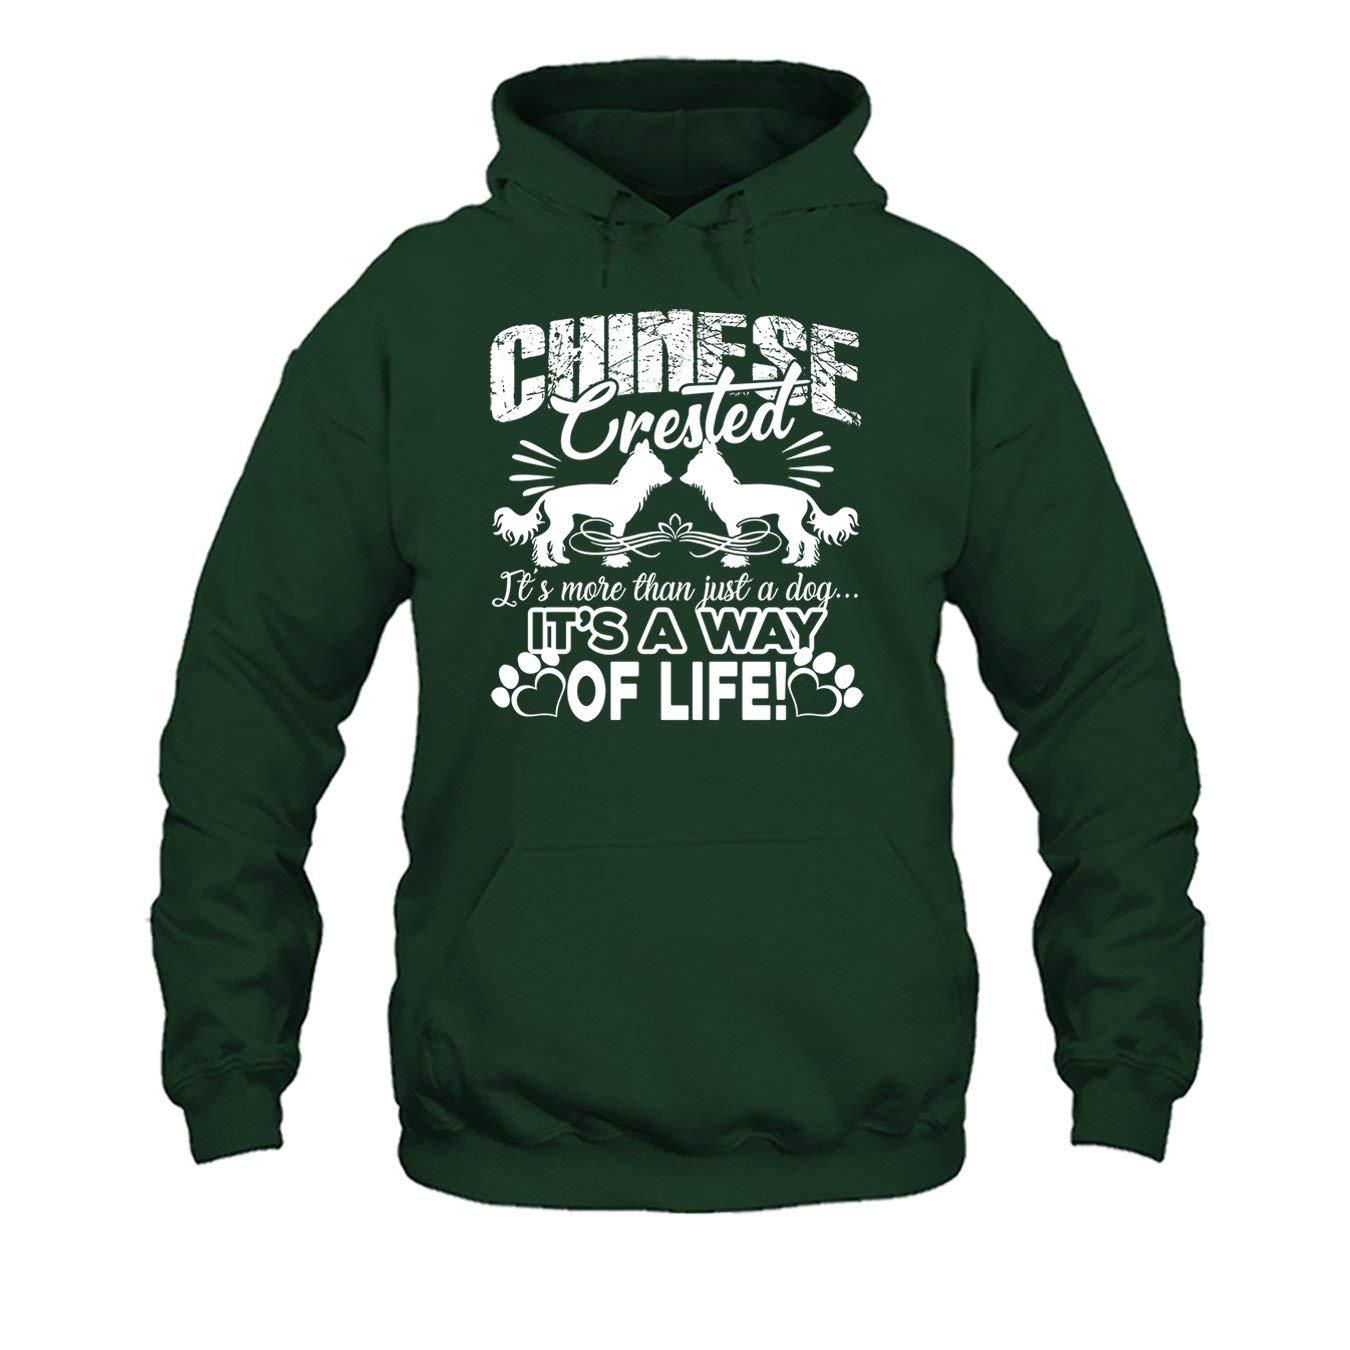 Hoodies Its A Way of Life Tee Shirt Shirt